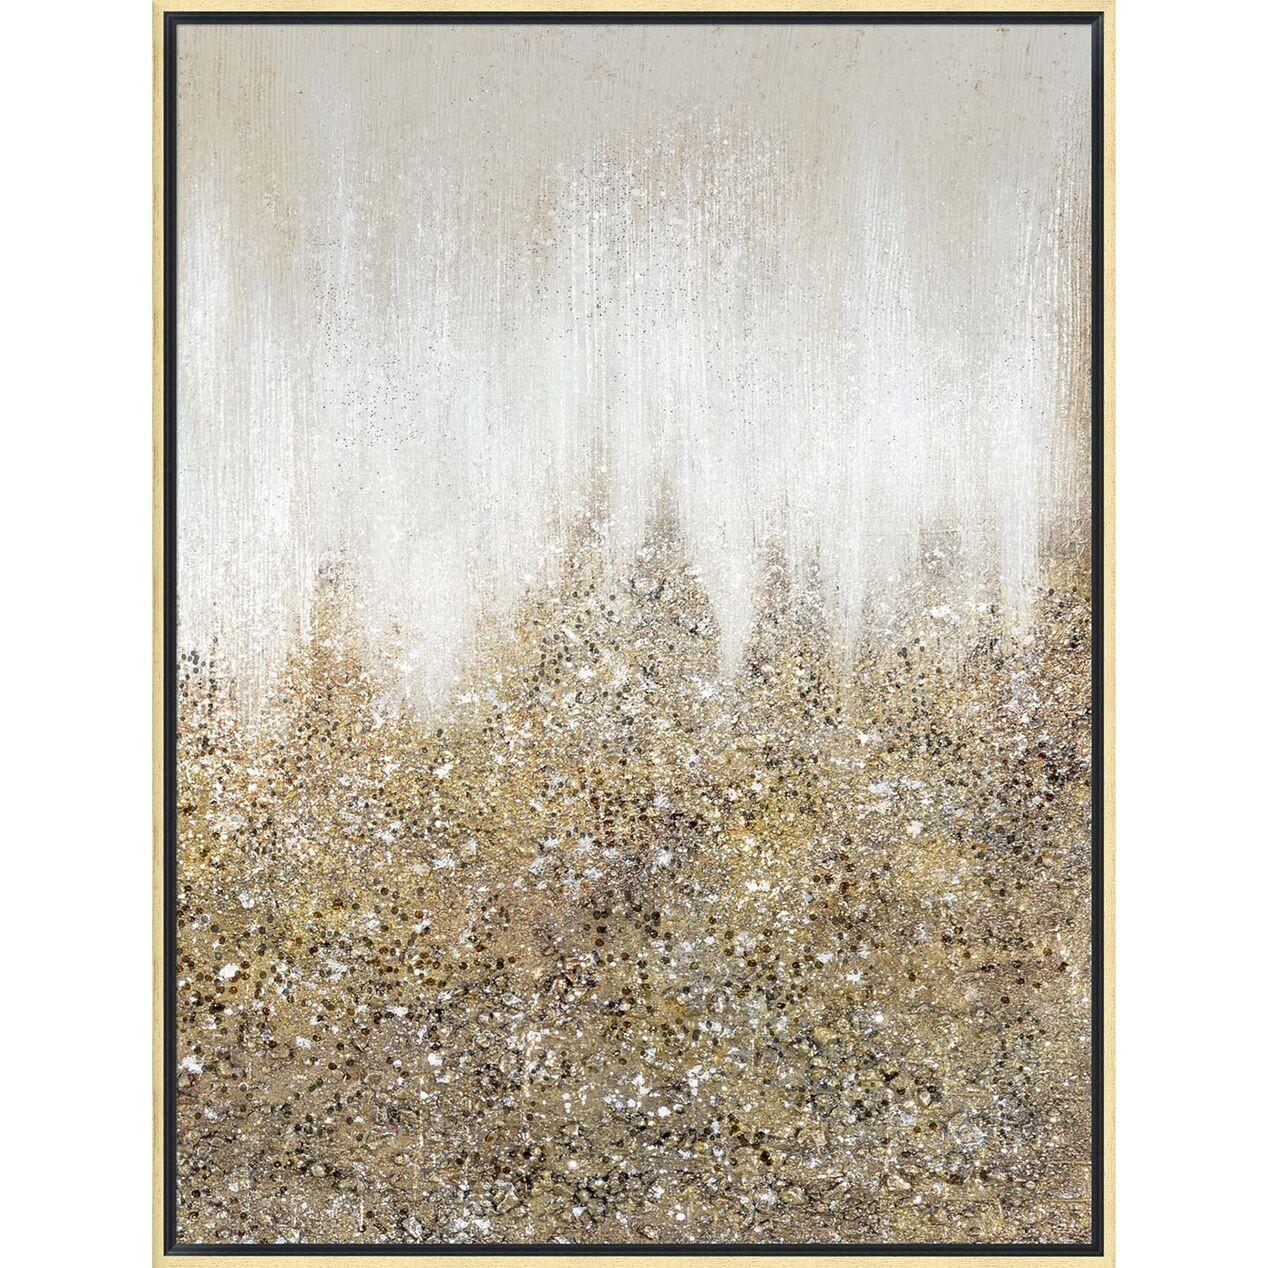 Gold Glitter Abstract Canvas Wall Art 30 X 40 At Home Glitter Wall Art Abstract Canvas Wall Art Diy Abstract Canvas Art